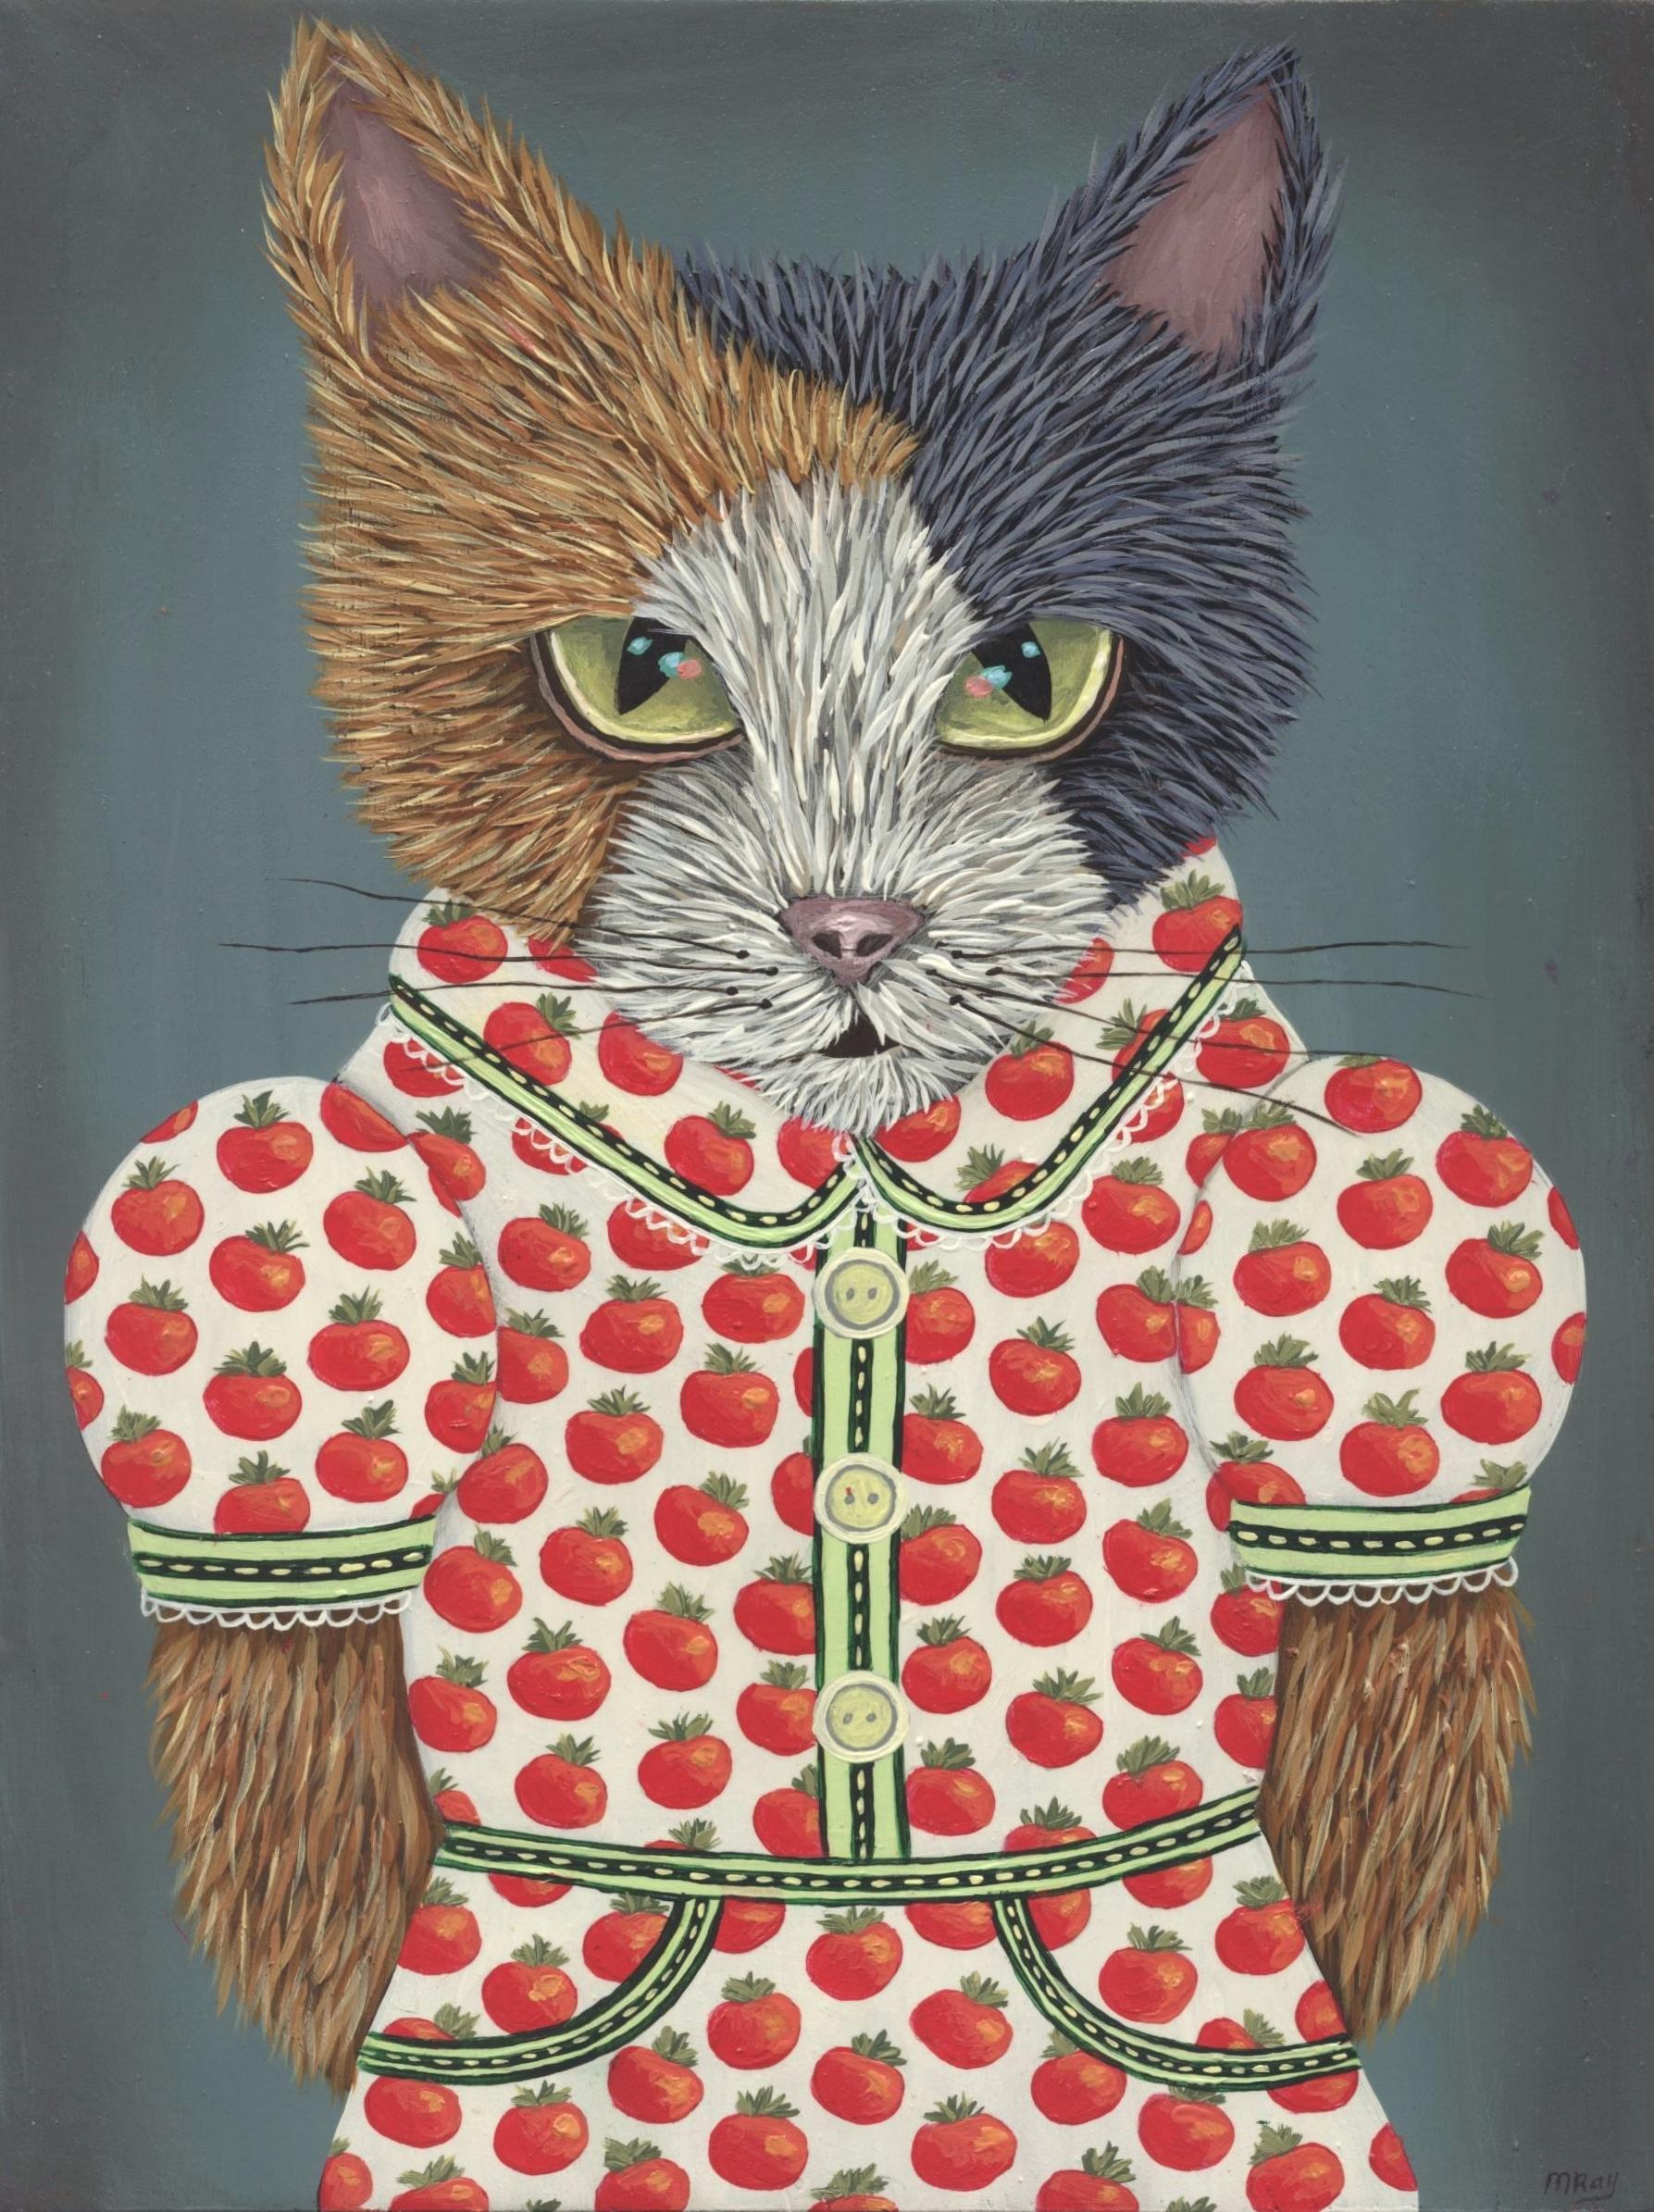 Kitty's Tomato Dress